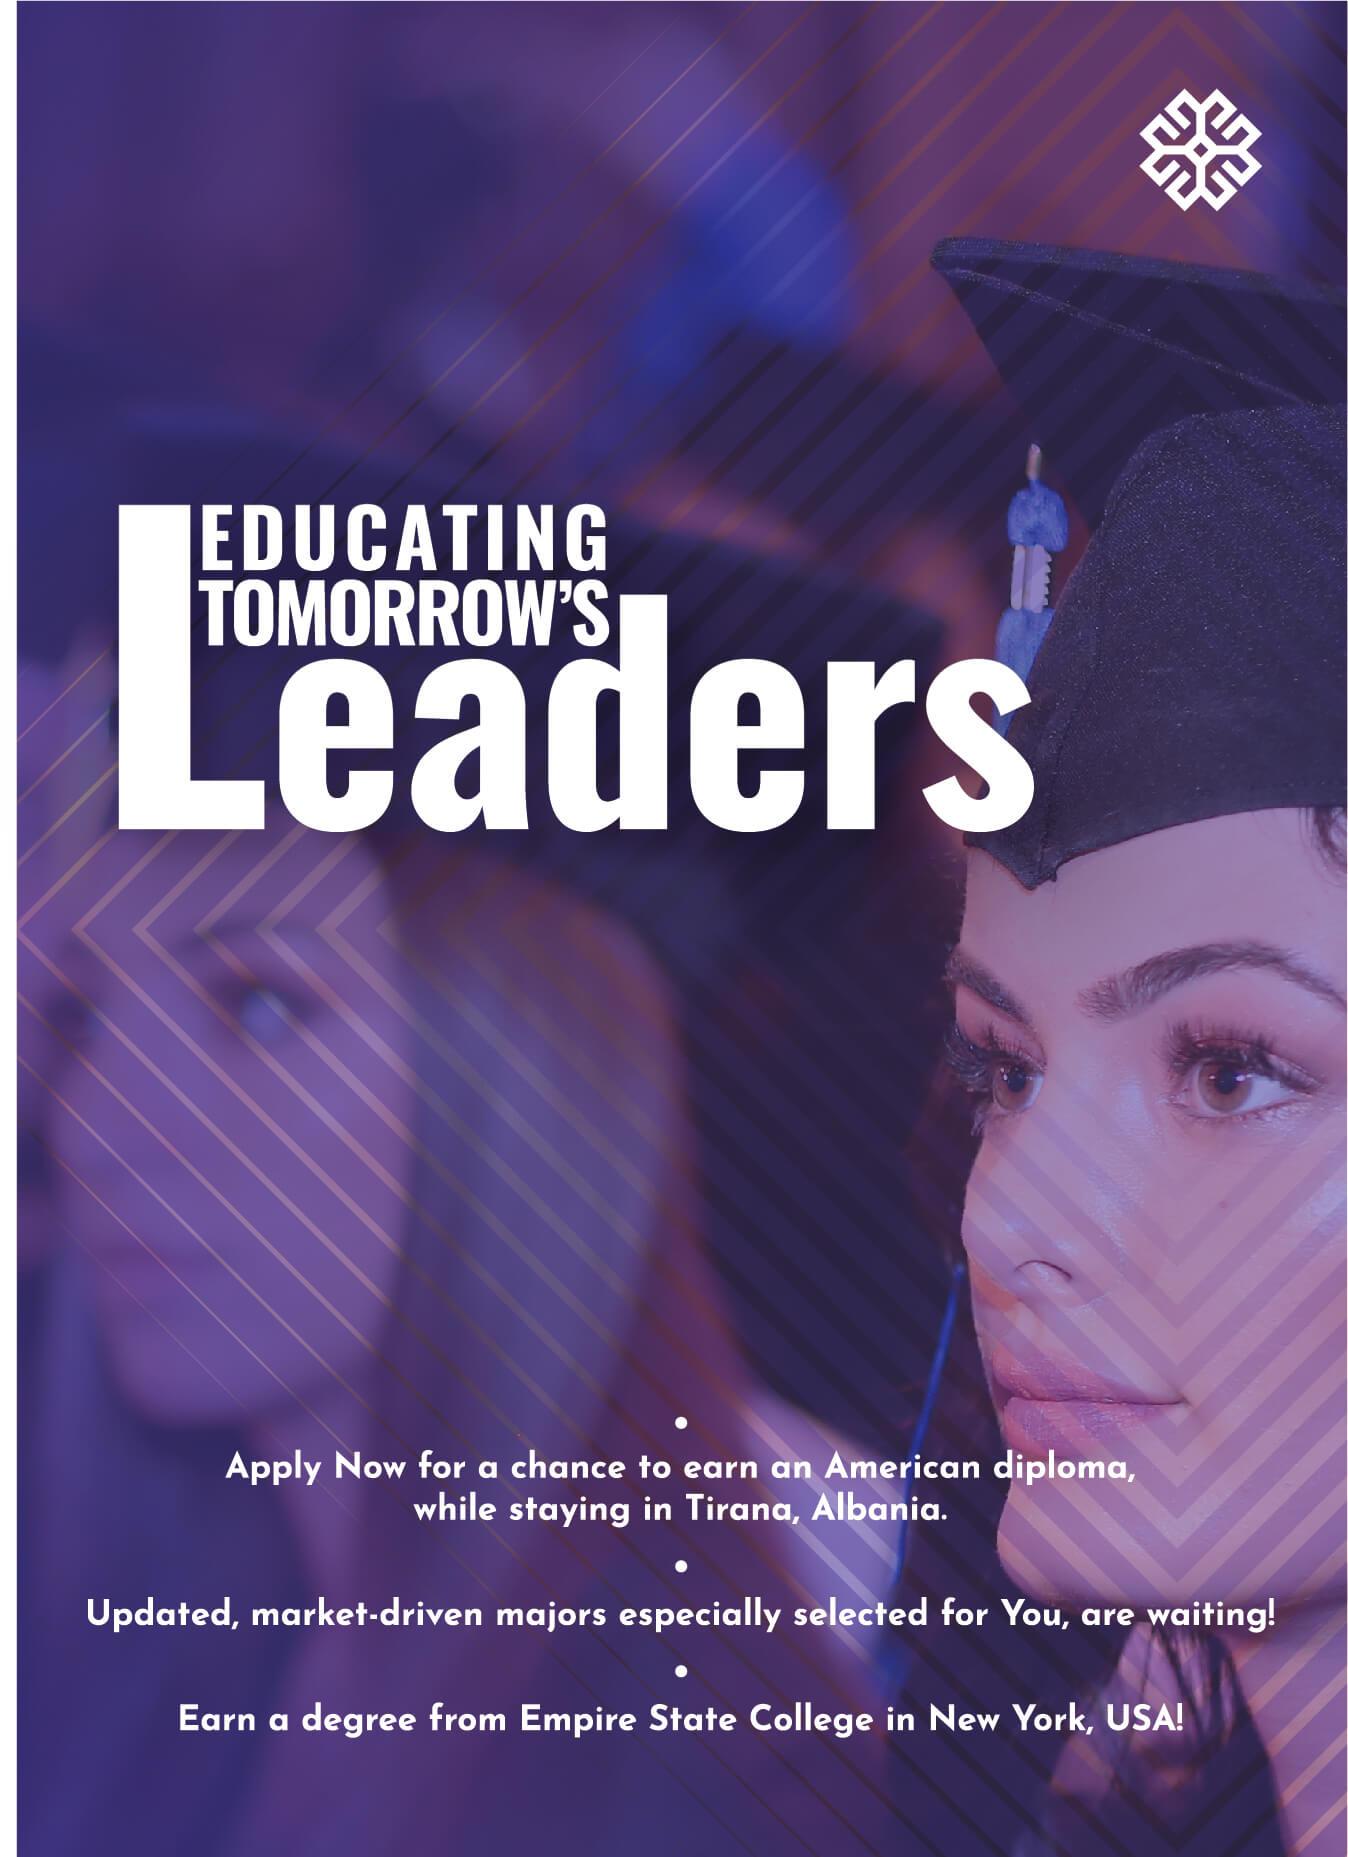 Job Vacancies - Work with us | University of New York Tirana